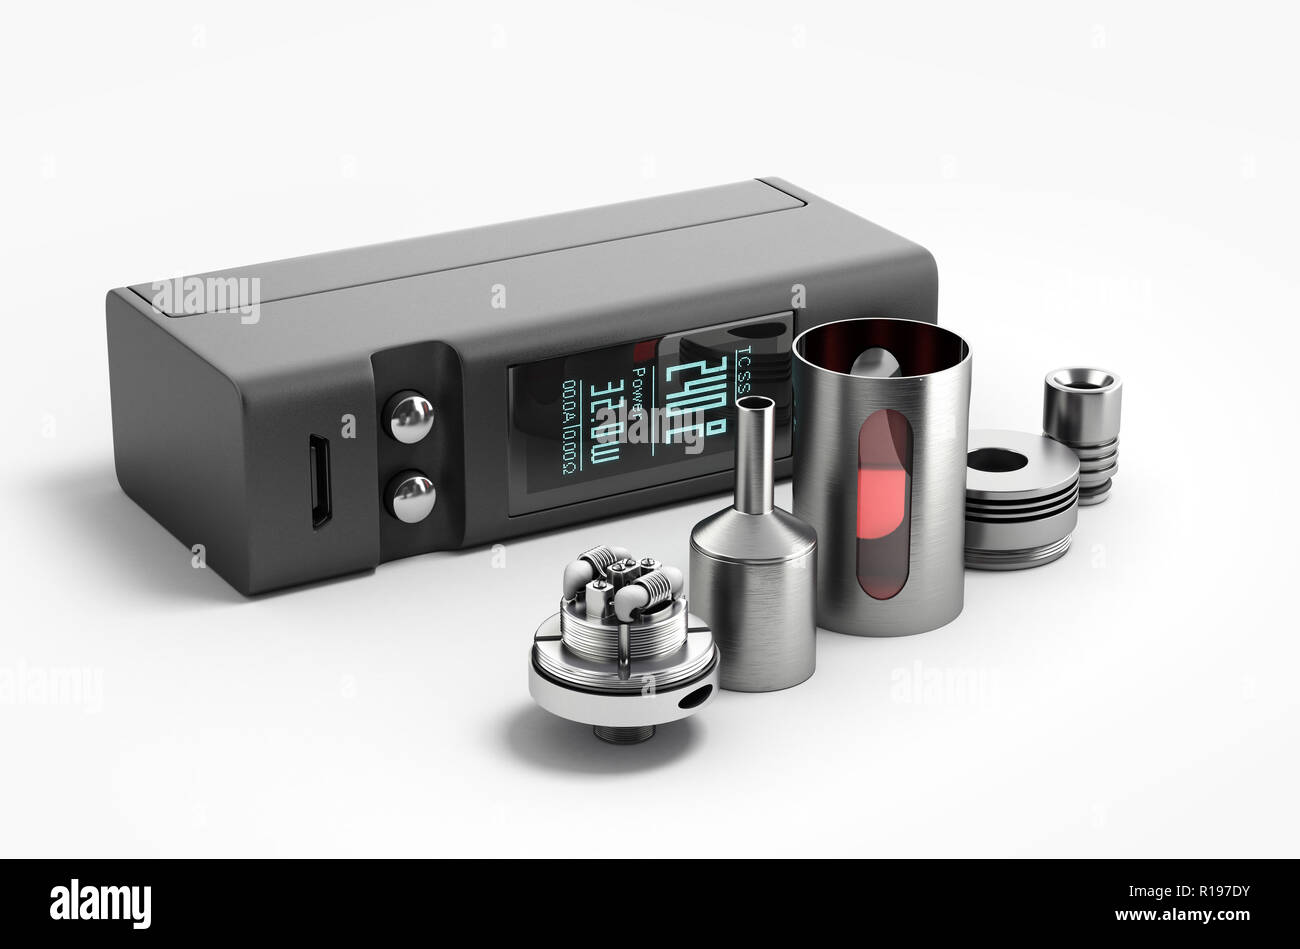 Electronic cigaretts Device box mod to smokeless smoking 3d render - Stock Image